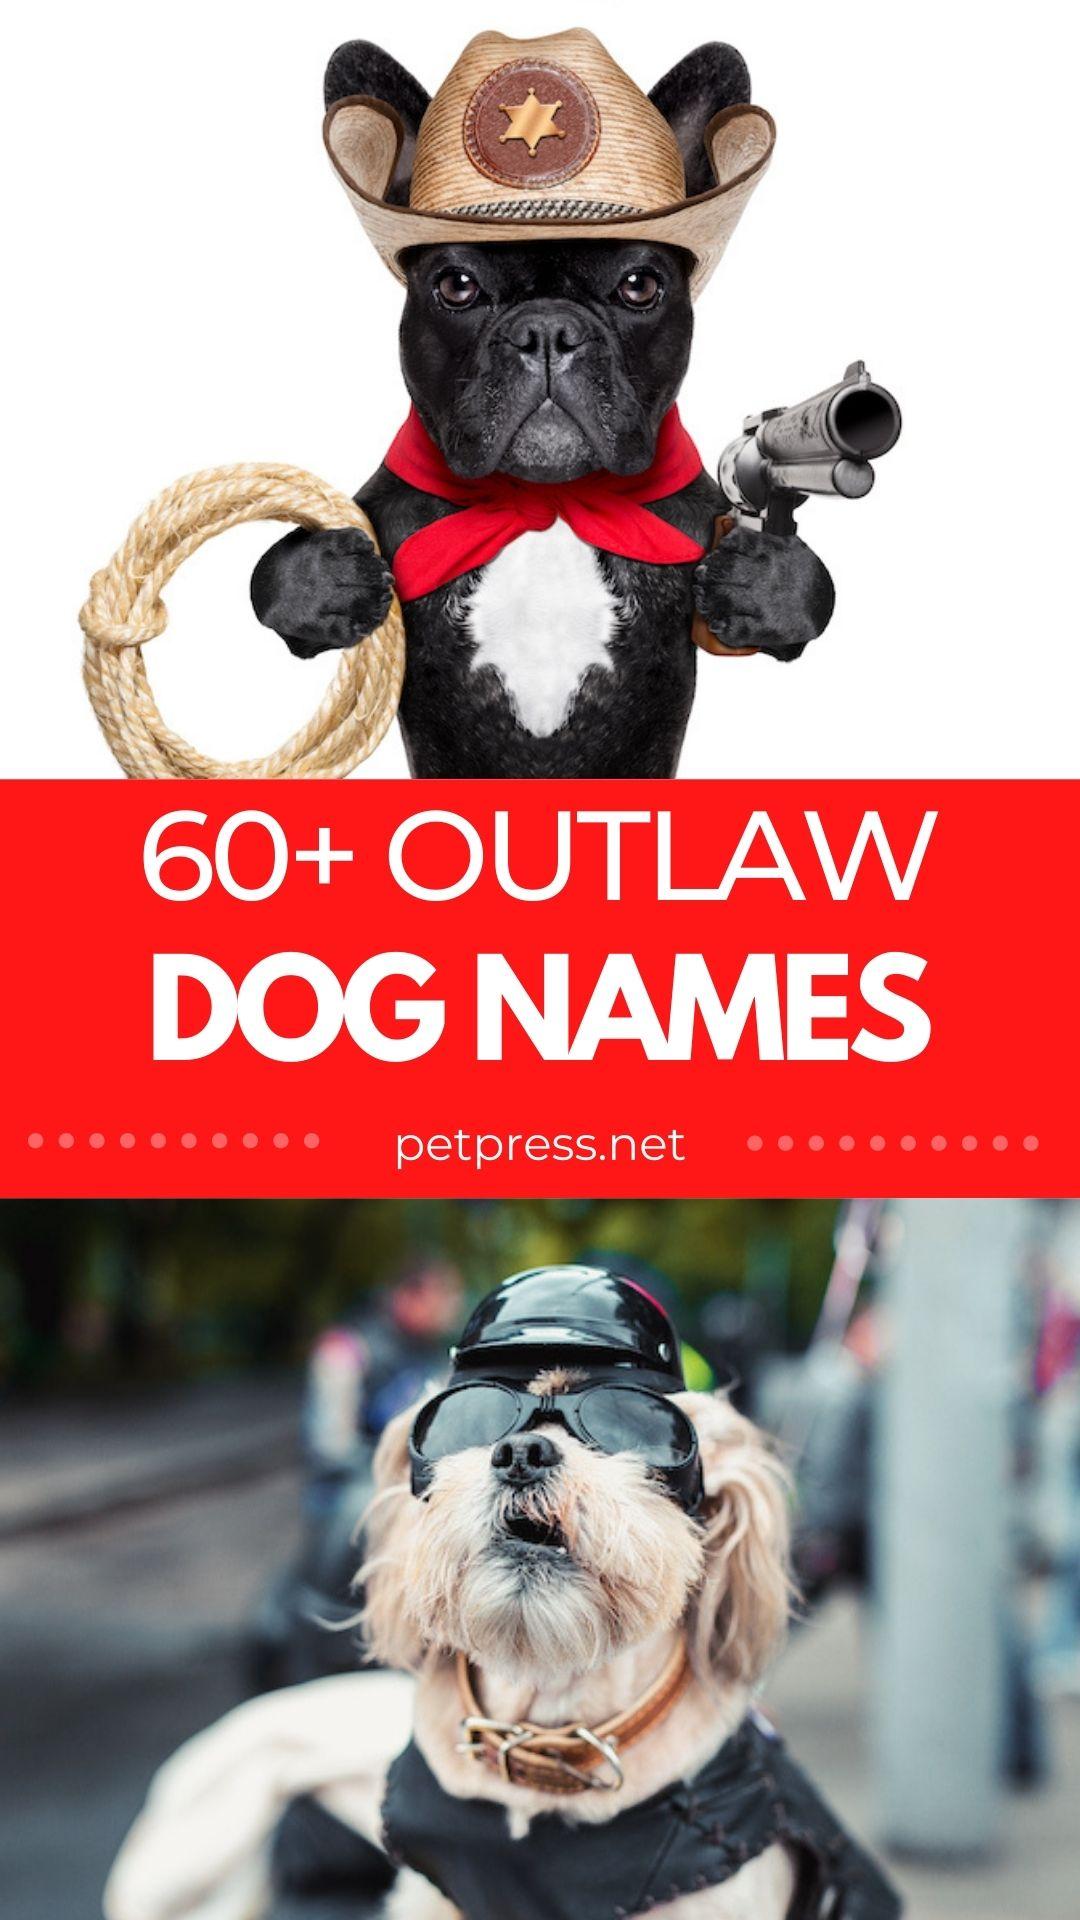 60+ outlaw dog names